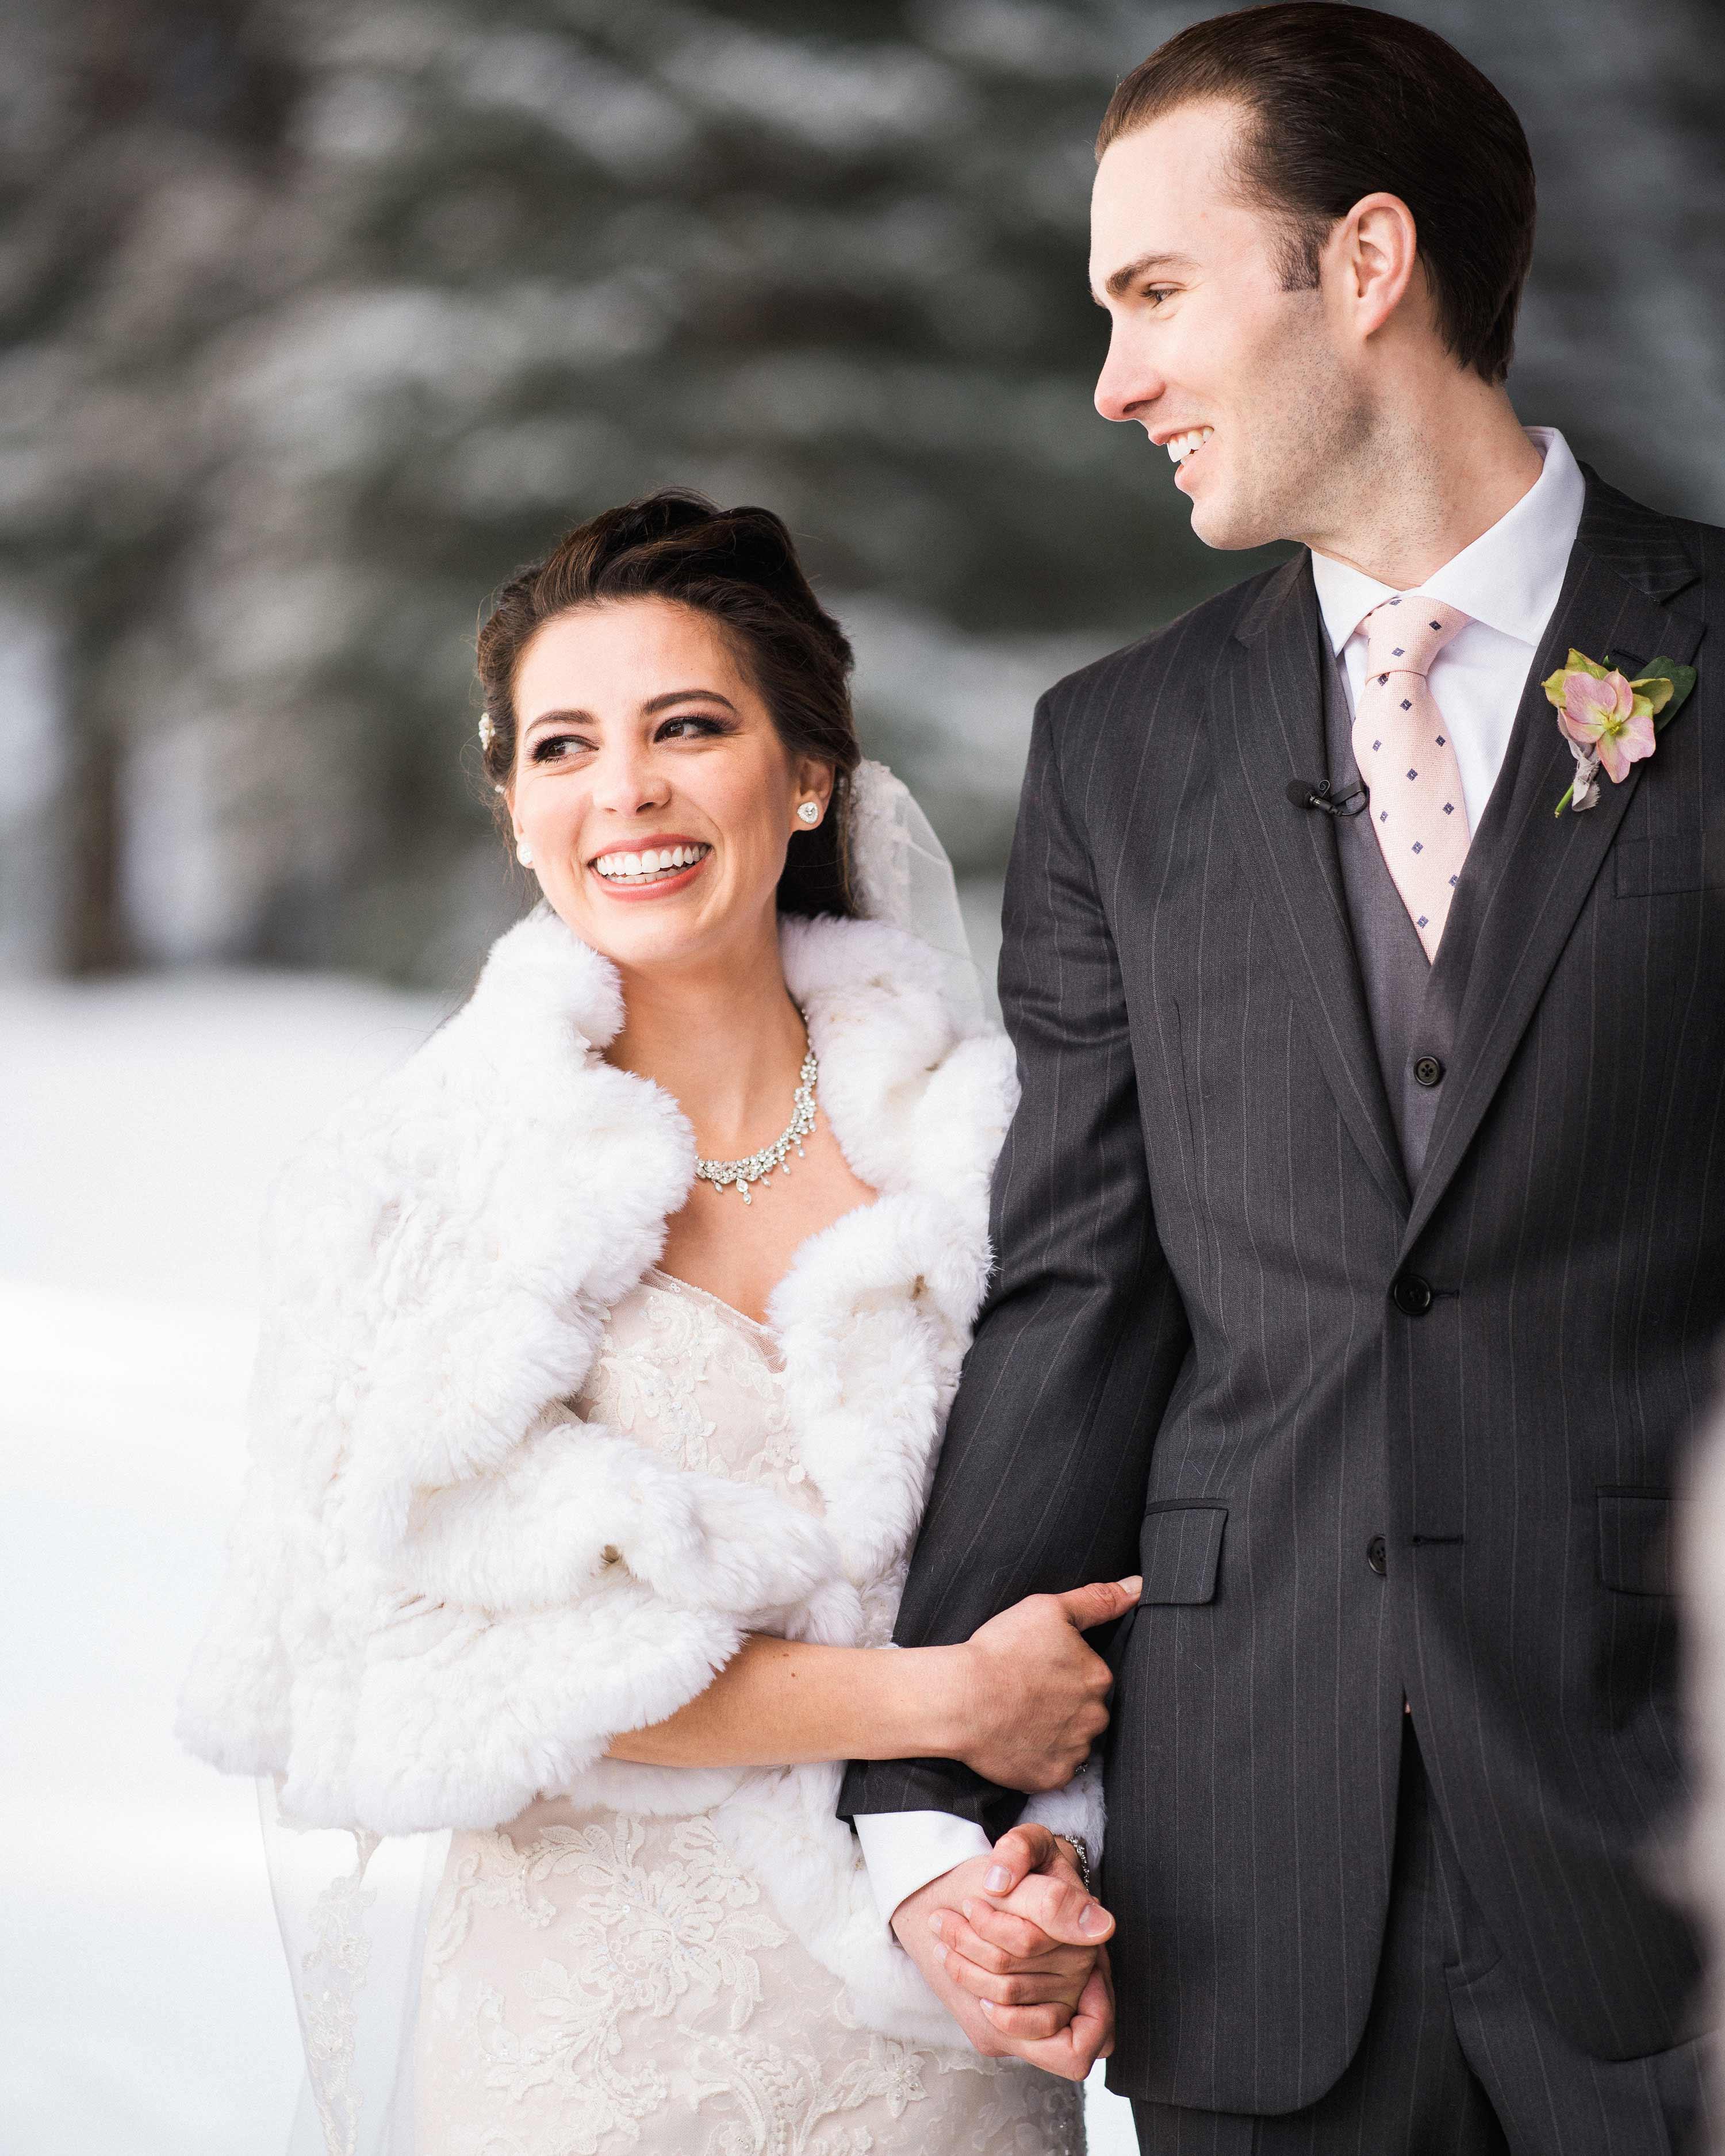 meshach-warren-wedding-couple-0472-6134942-0716.jpg